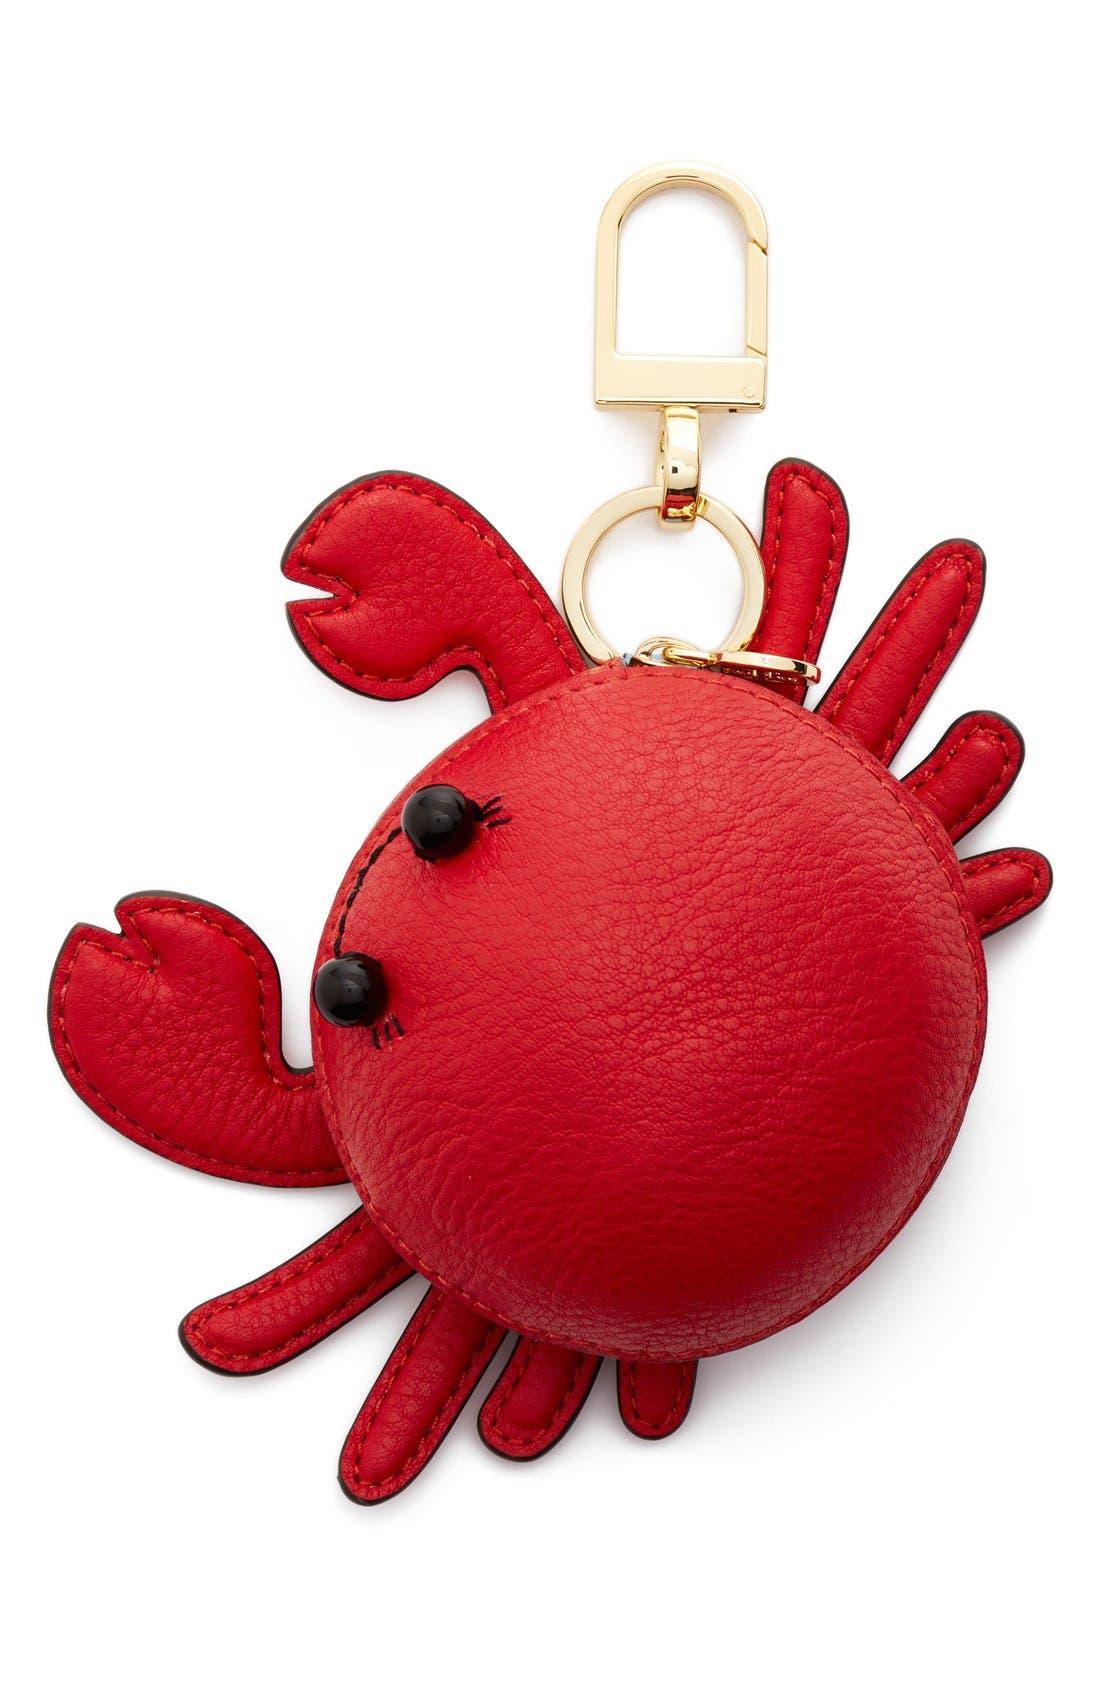 Alternate Image 3  - Tory Burch 'Carl Crab' Coin Pouch Bag Charm